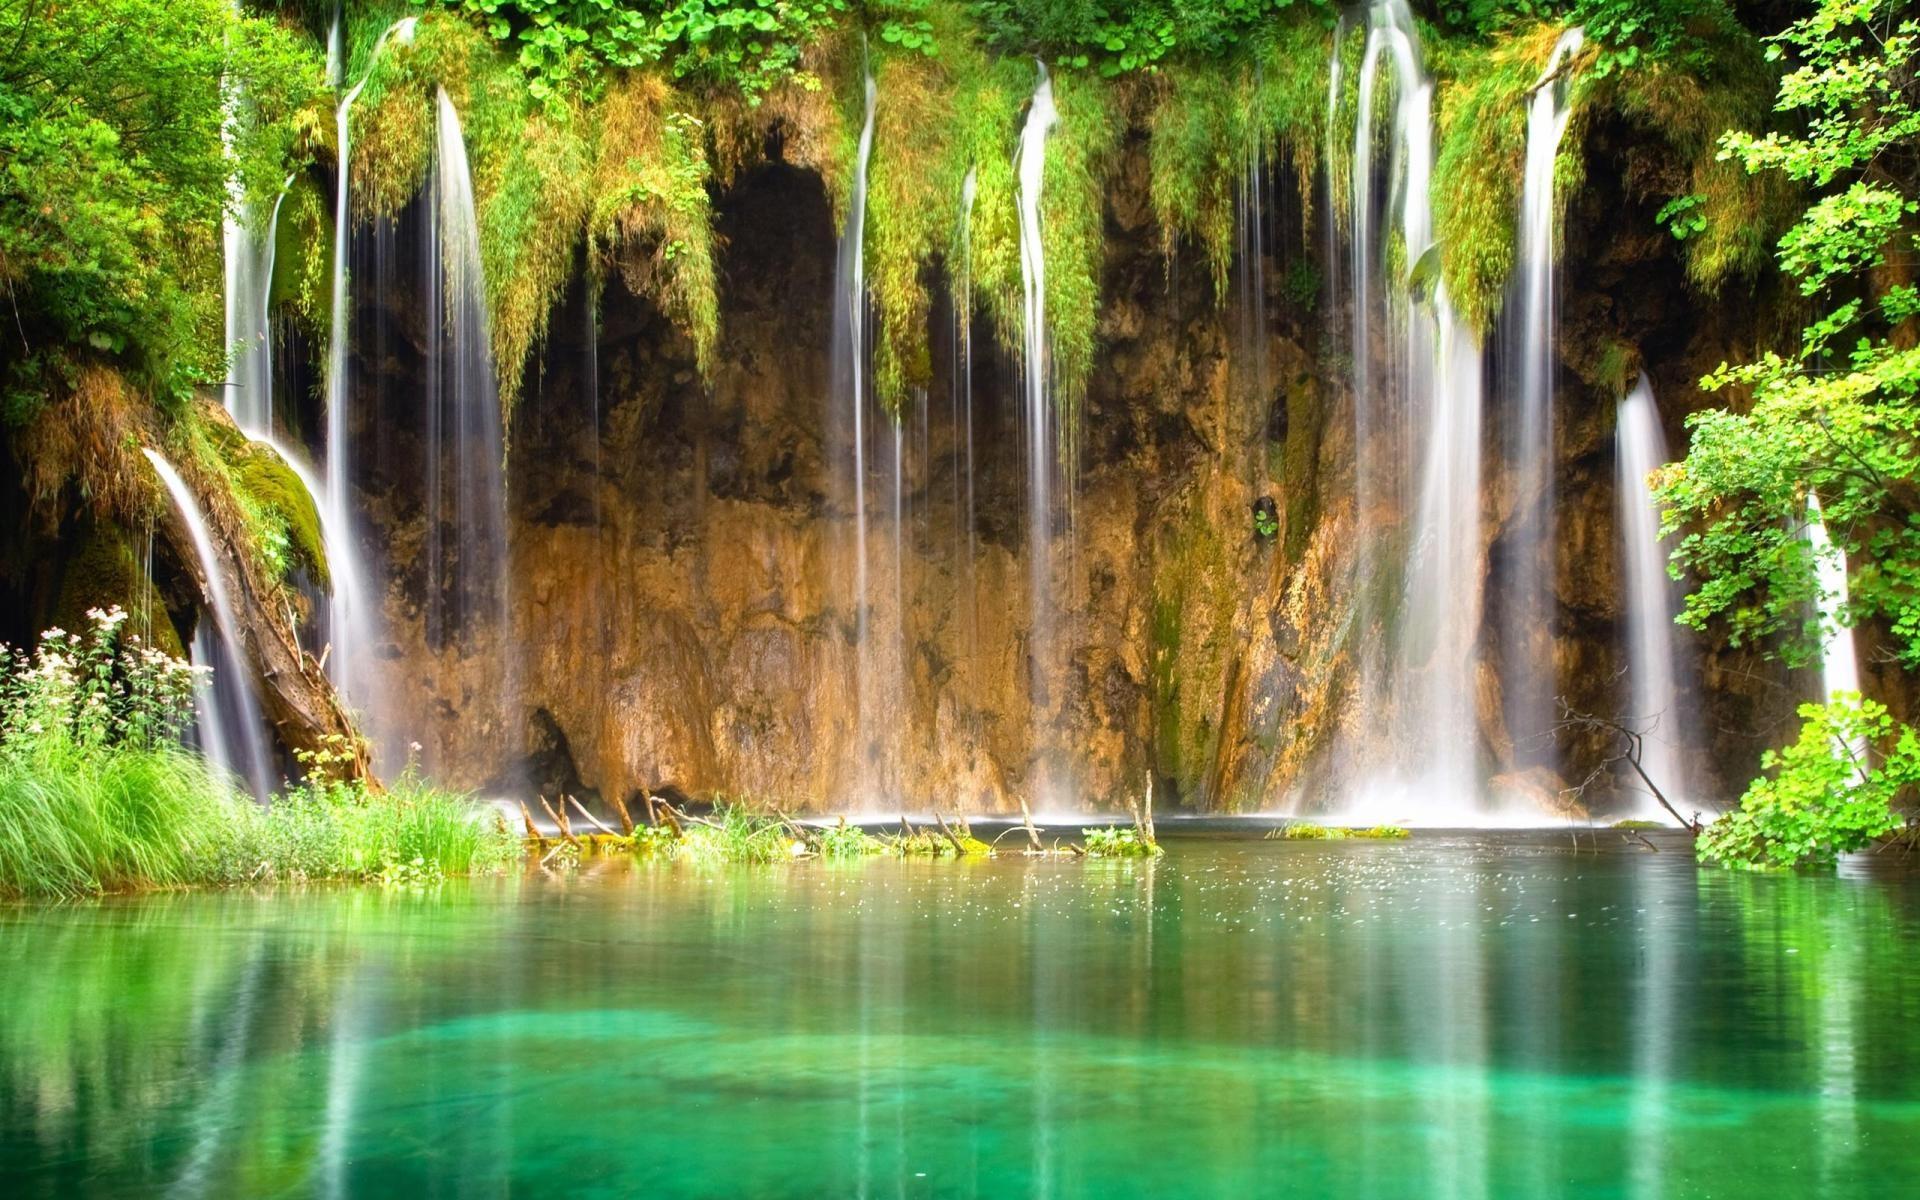 Hd wallpaper spring - Spring Waterfall Hd Free Desktop Hd Wallpaper